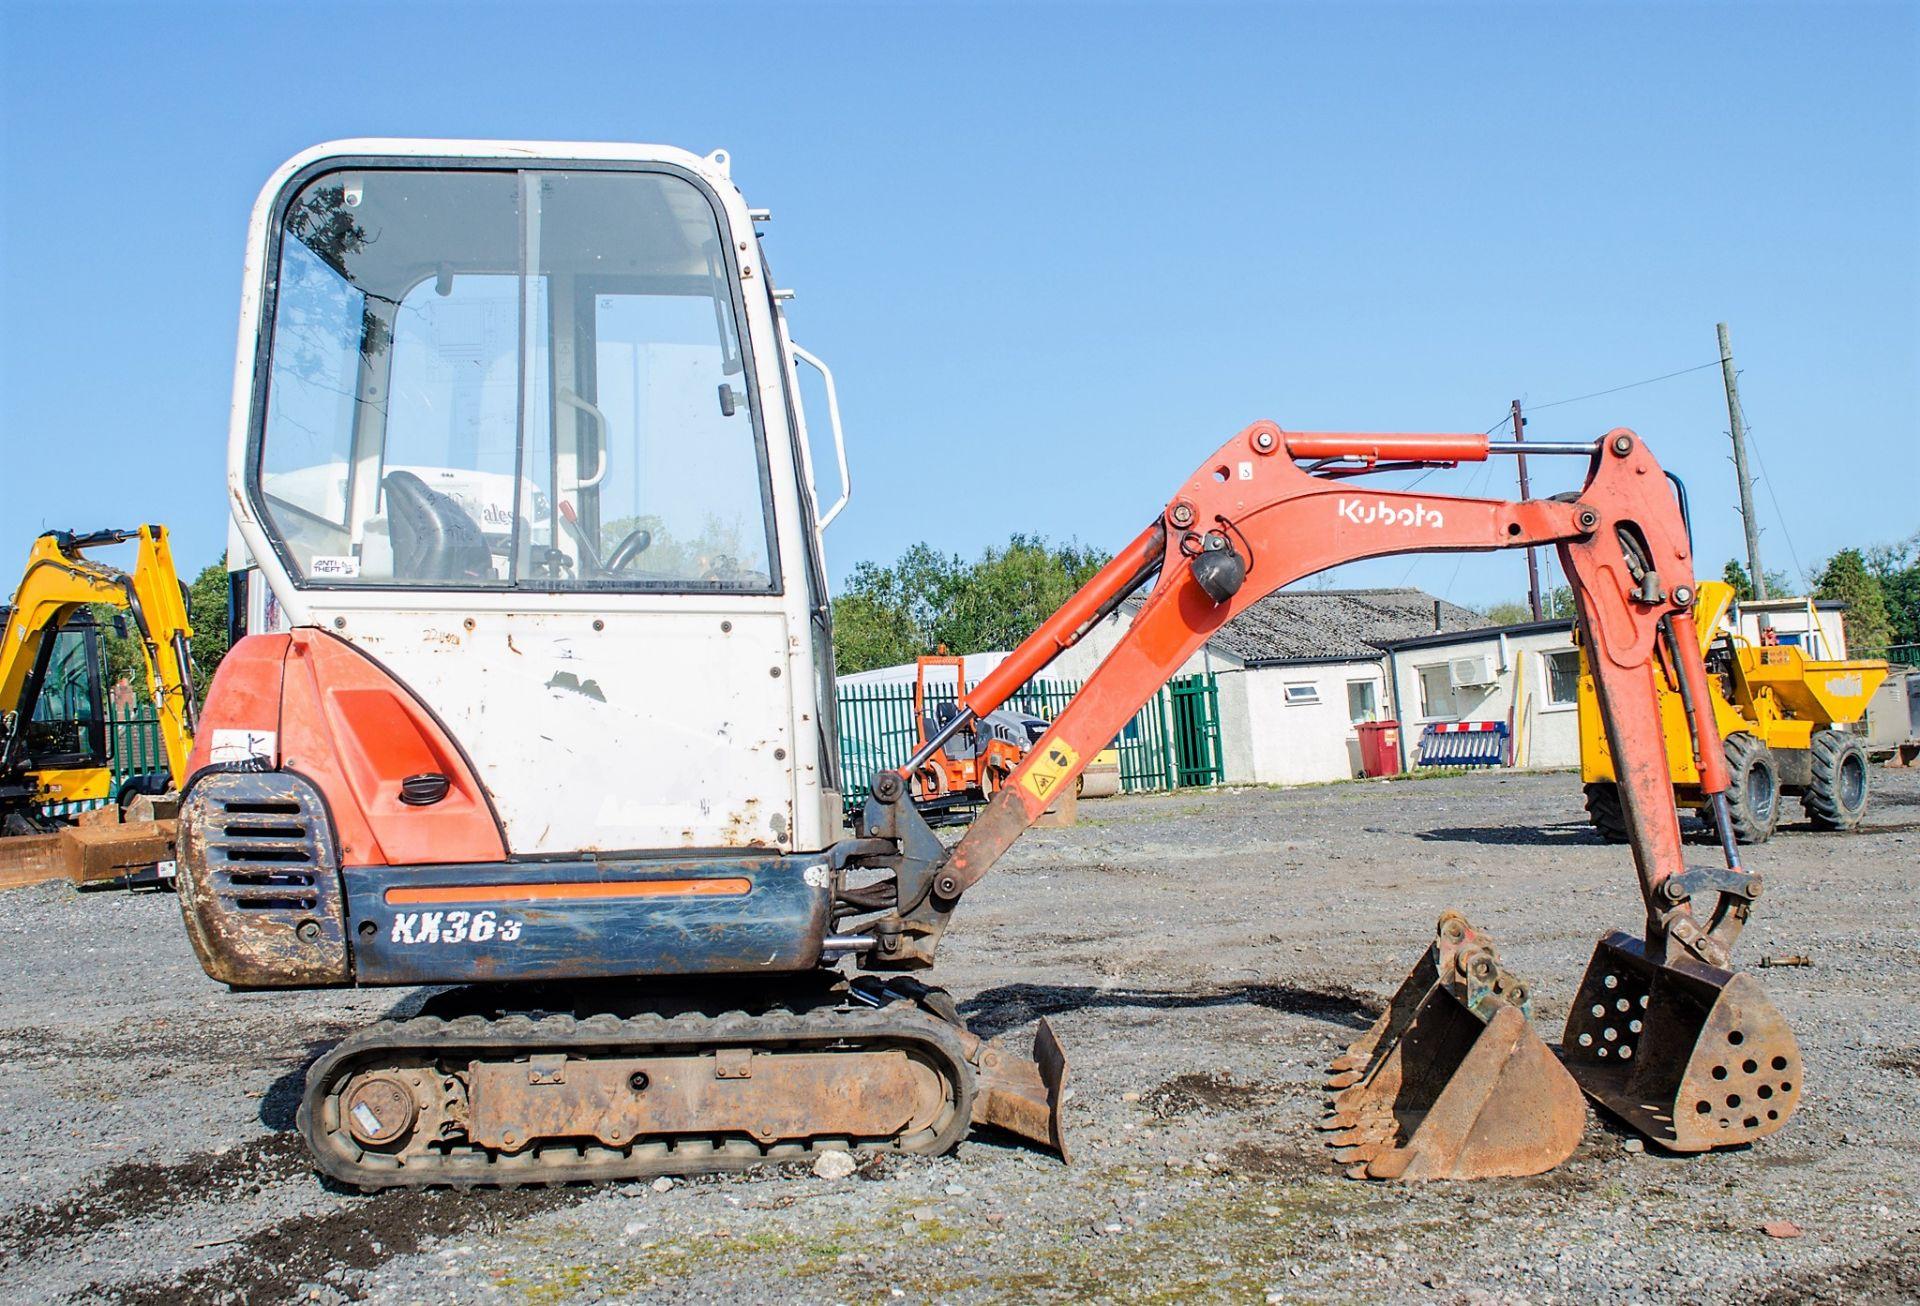 Kubota KX36-3 1.5 tonne rubber tracked mini excavator Year: 2007 S/N: Z077298 Recorded Hours: 4205 - Image 8 of 18